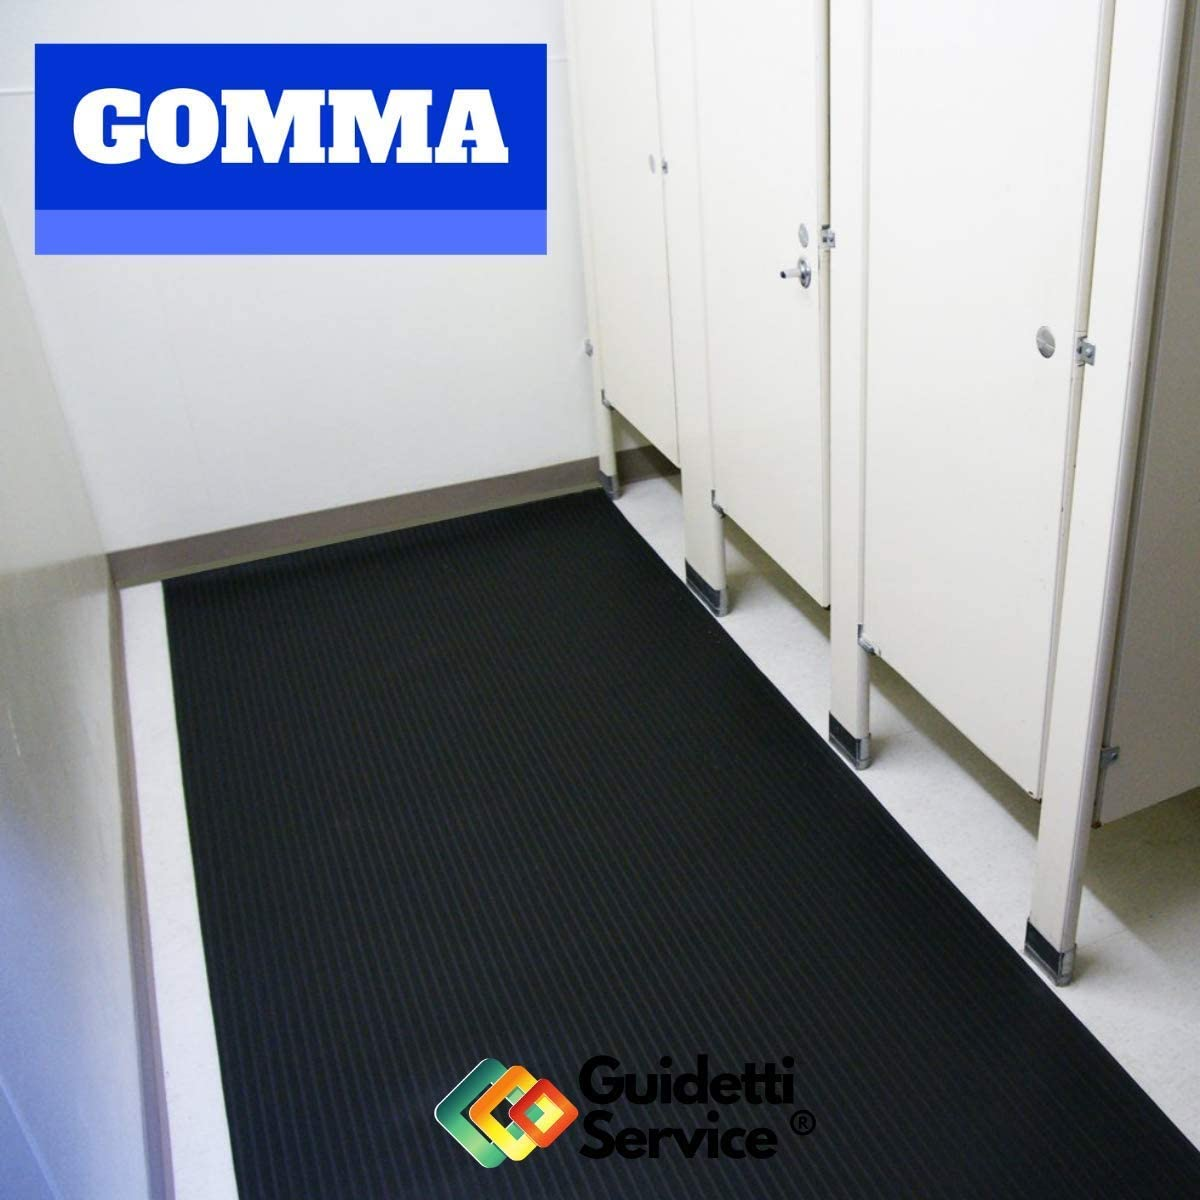 altura 120 cm de Guidetti Service /® Alfombra de goma antideslizante de rayas